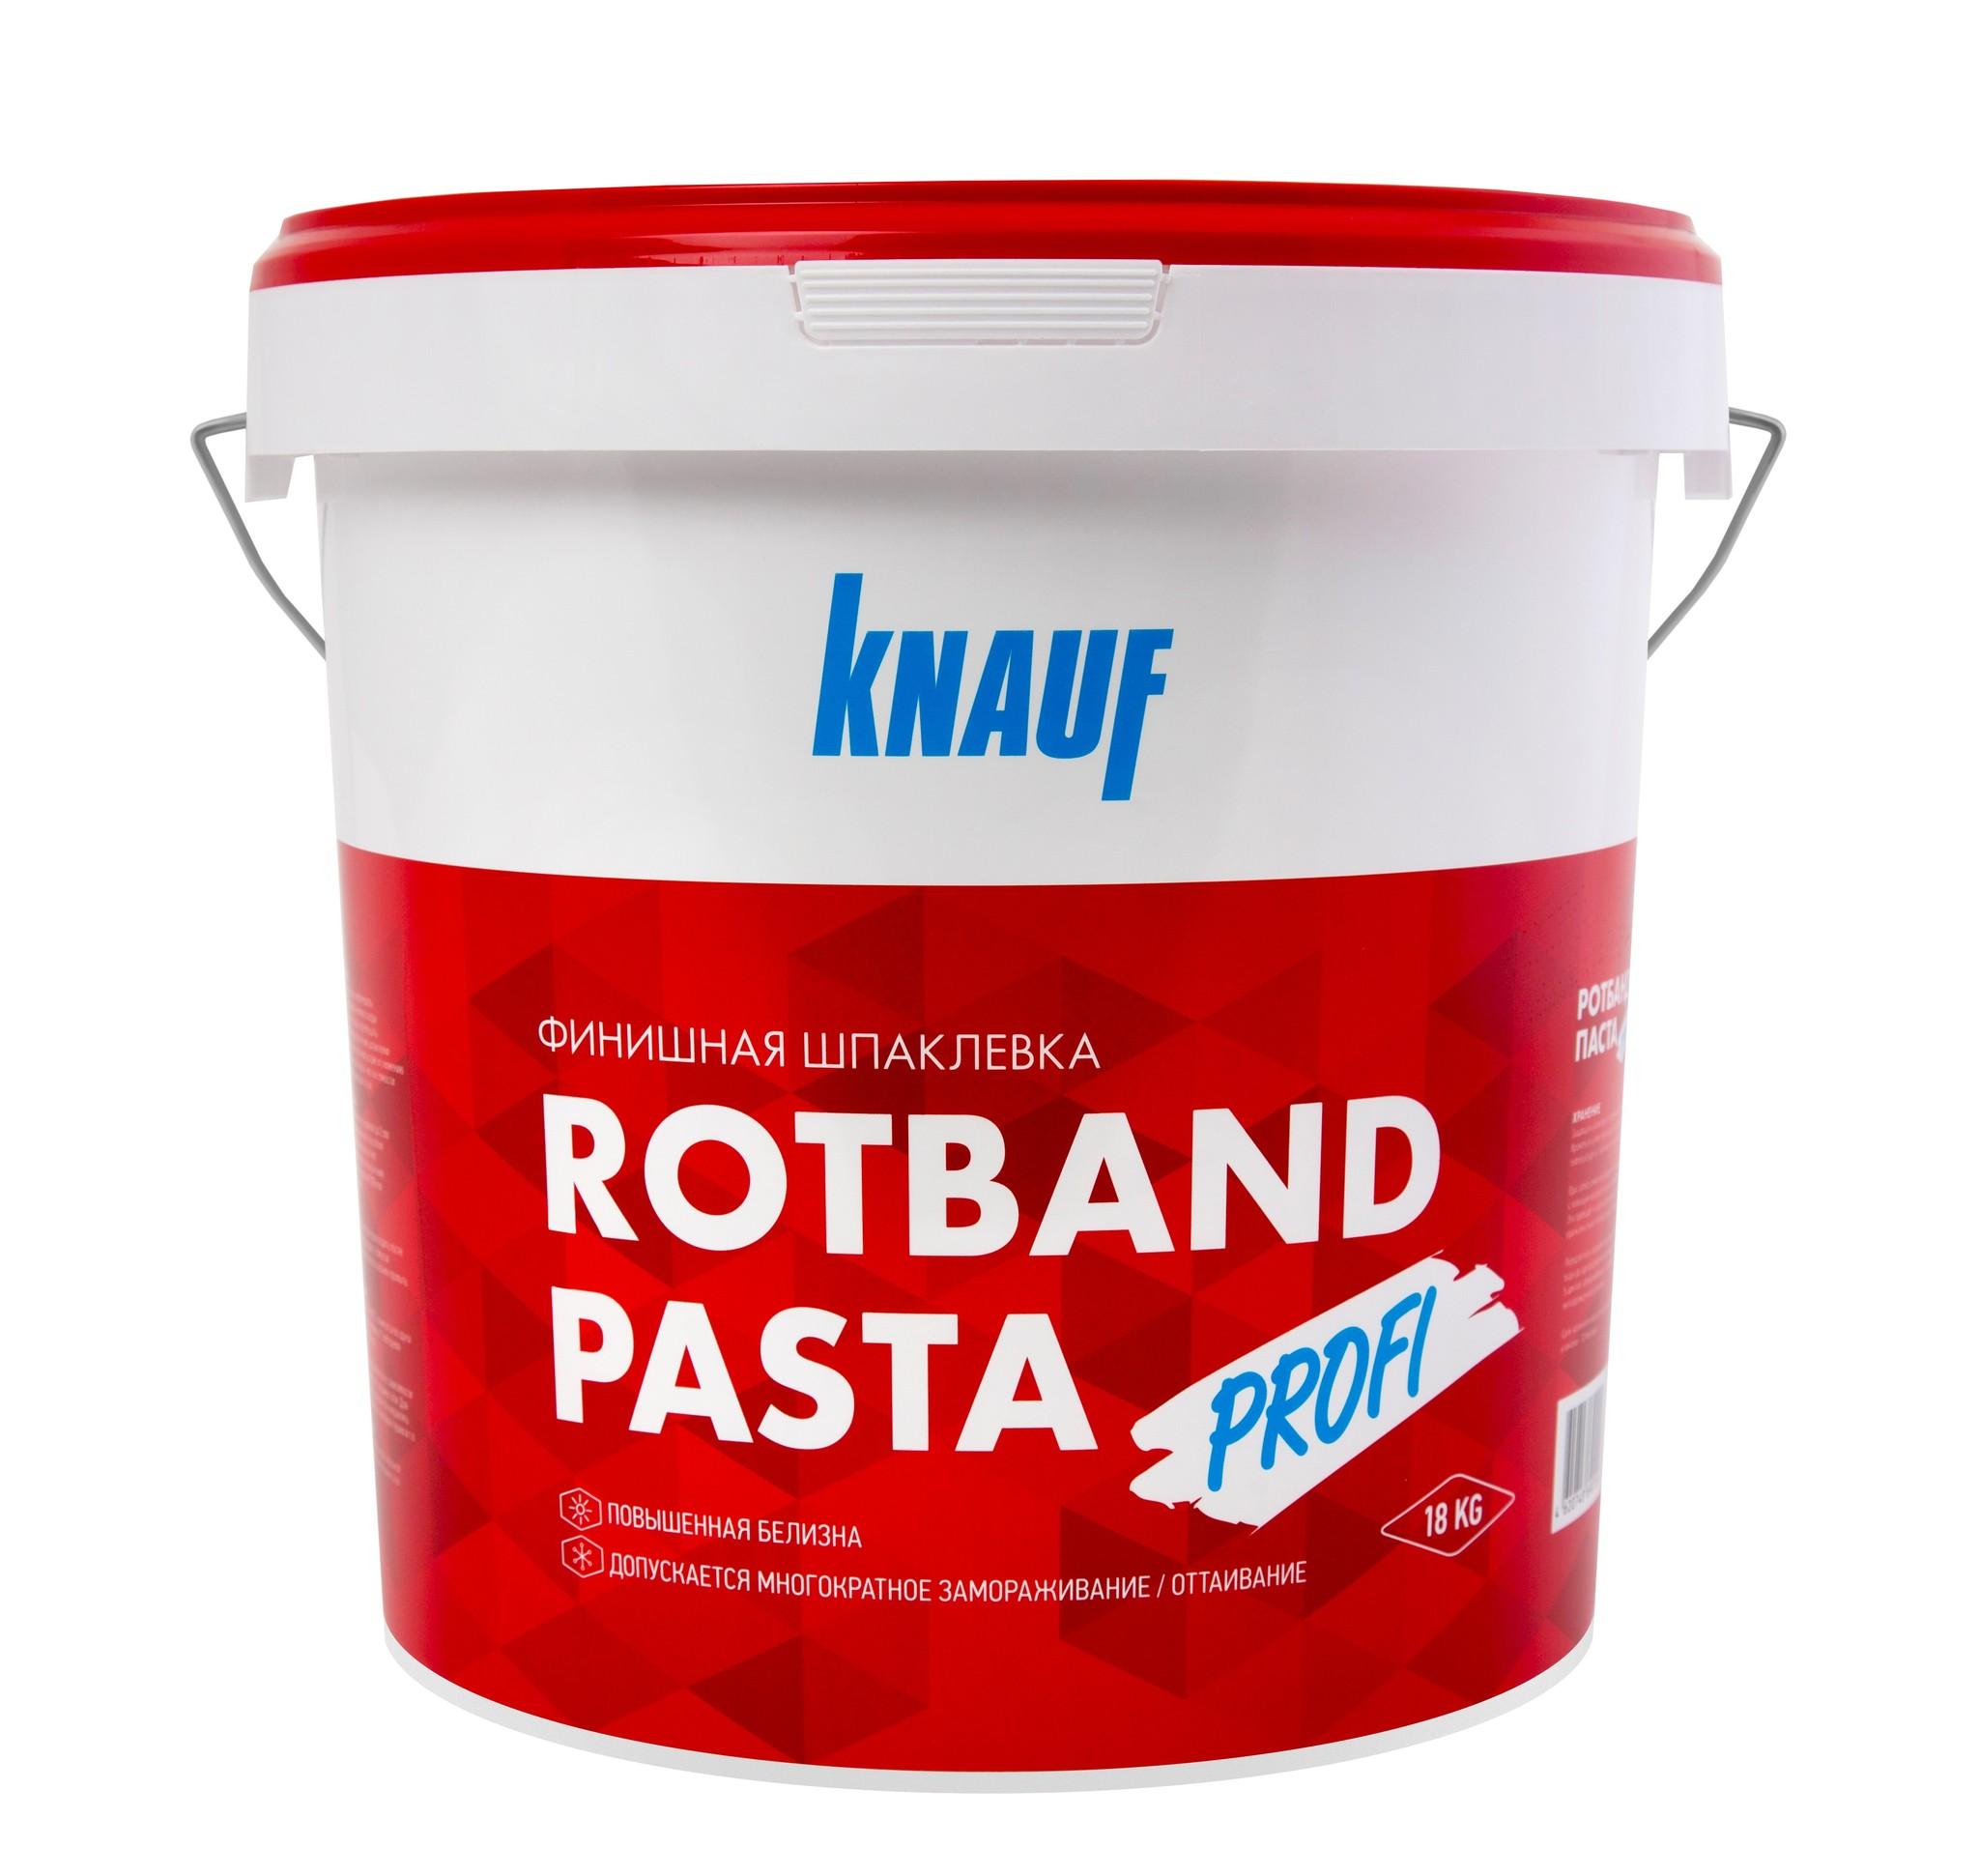 Шпаклевки Готовая шпаклёвка Knauf Ротбанд Паста виниловая, 18 кг a0bc1490e5b54e528fc6cacbd27968da.jpg